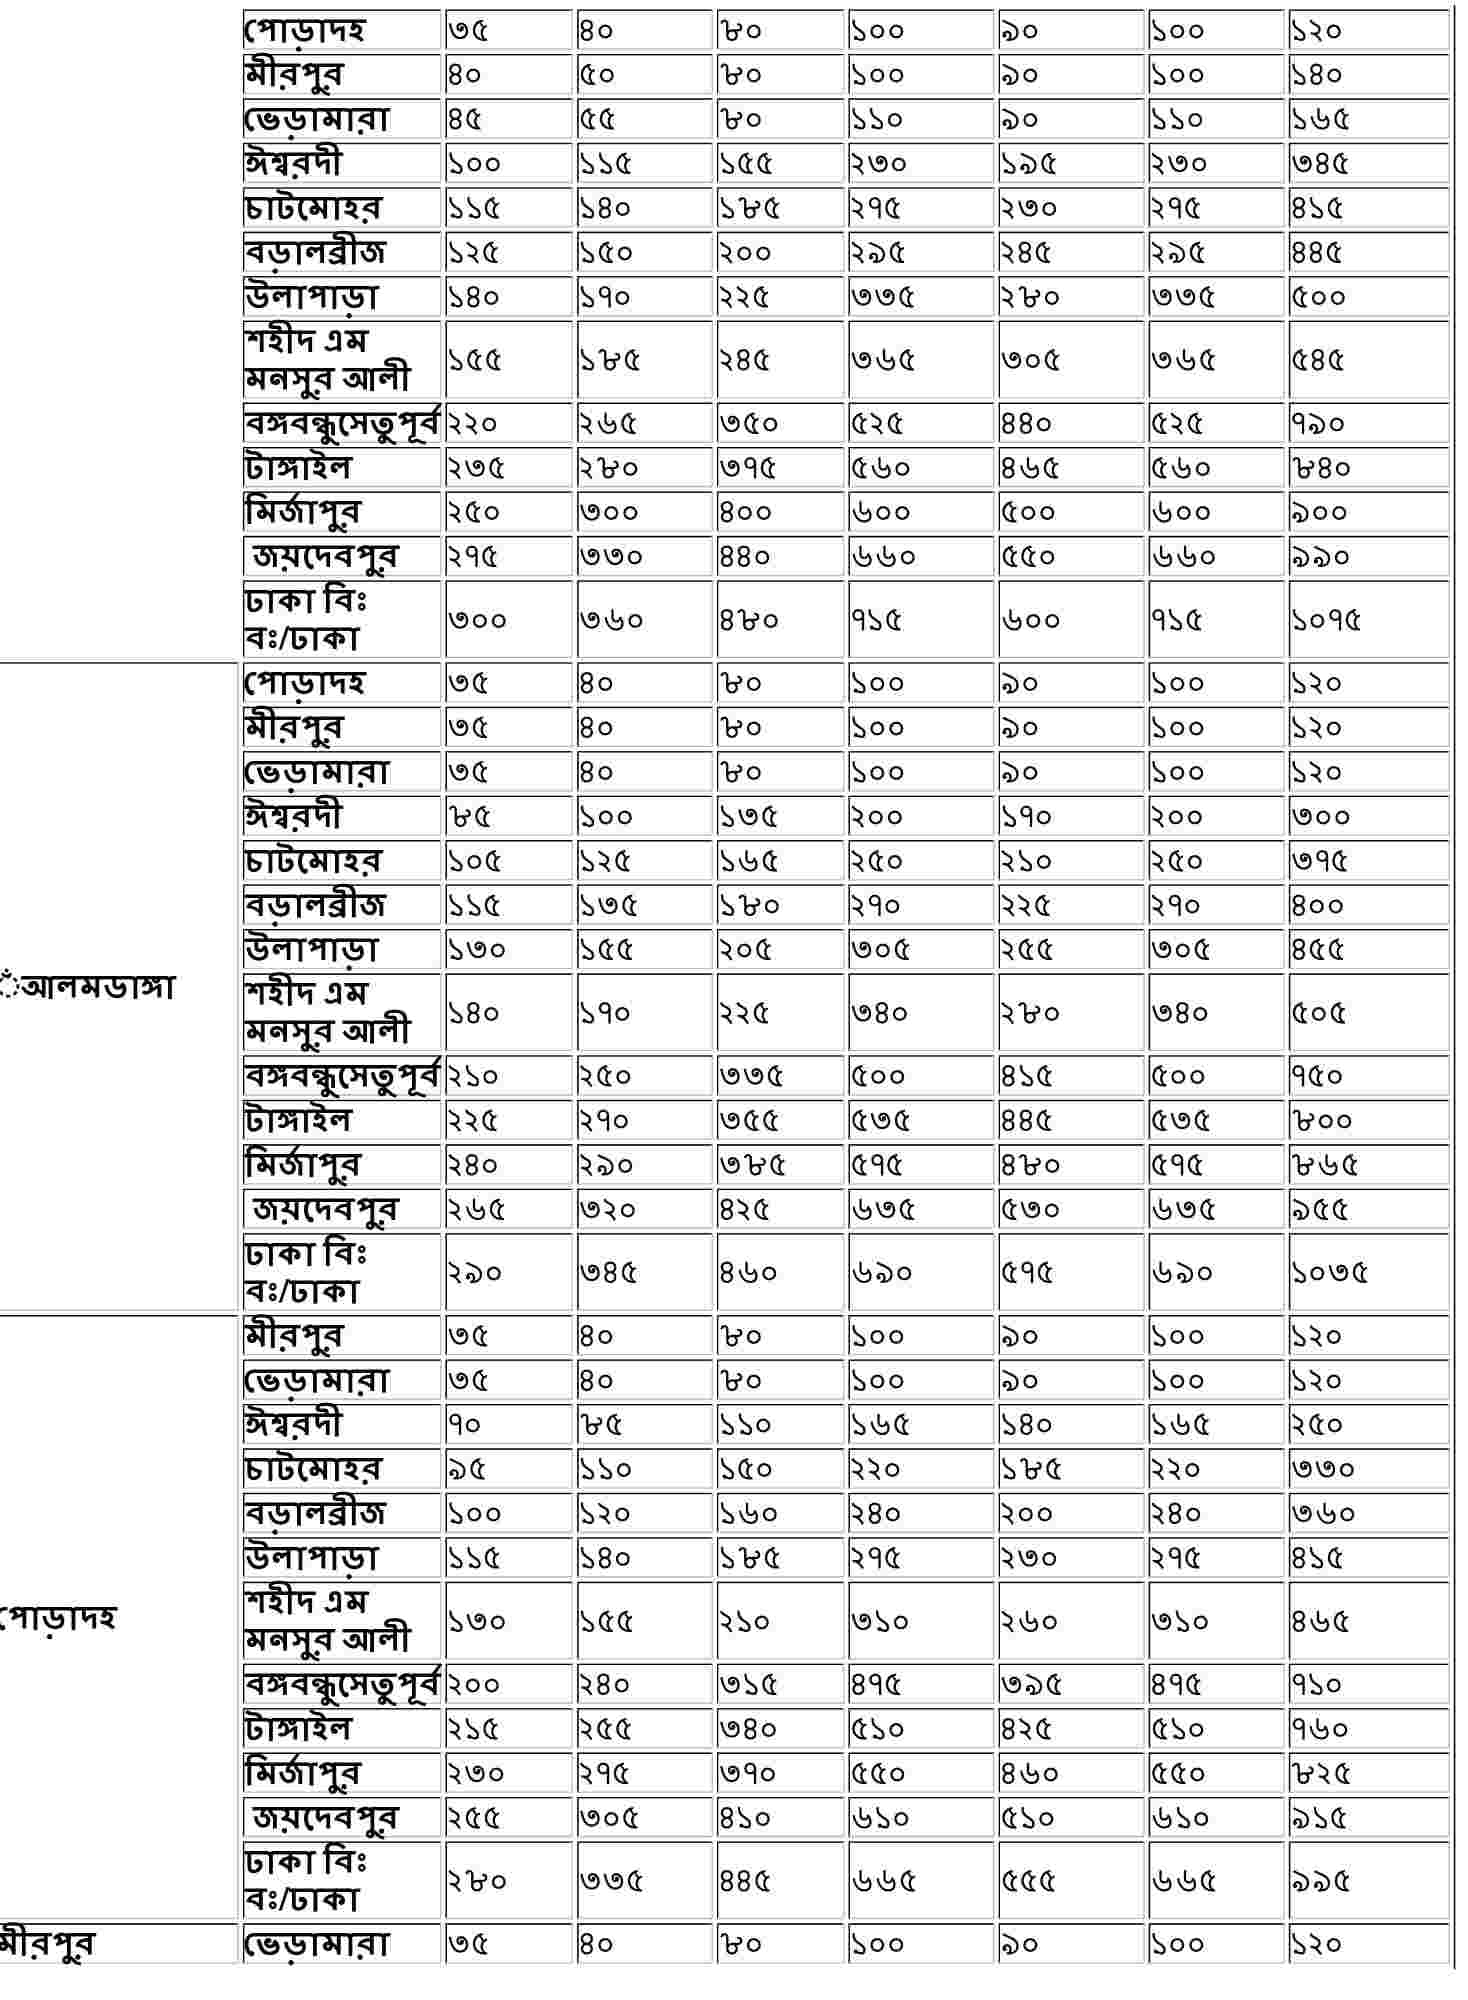 Bangladesh Railway Ticket Price 2021 [East Zone, West Zone]